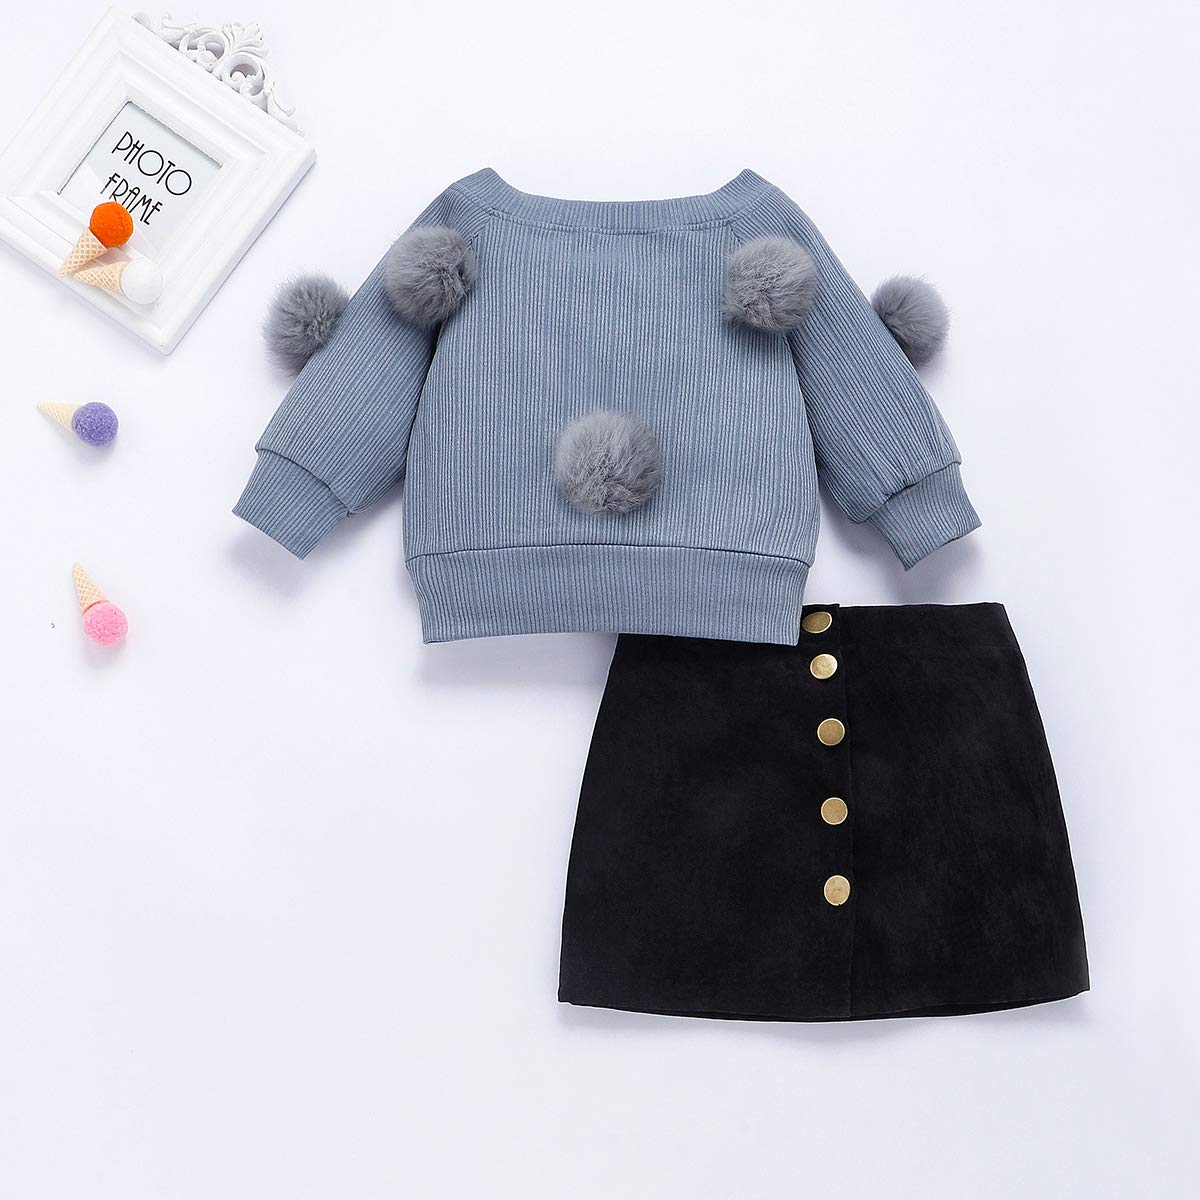 Button Pencil A-Line Skirt Set Fall Winter Clothes 2Pcs Toddler Baby Girls Long Sleeve Ball Knit Sweater Top